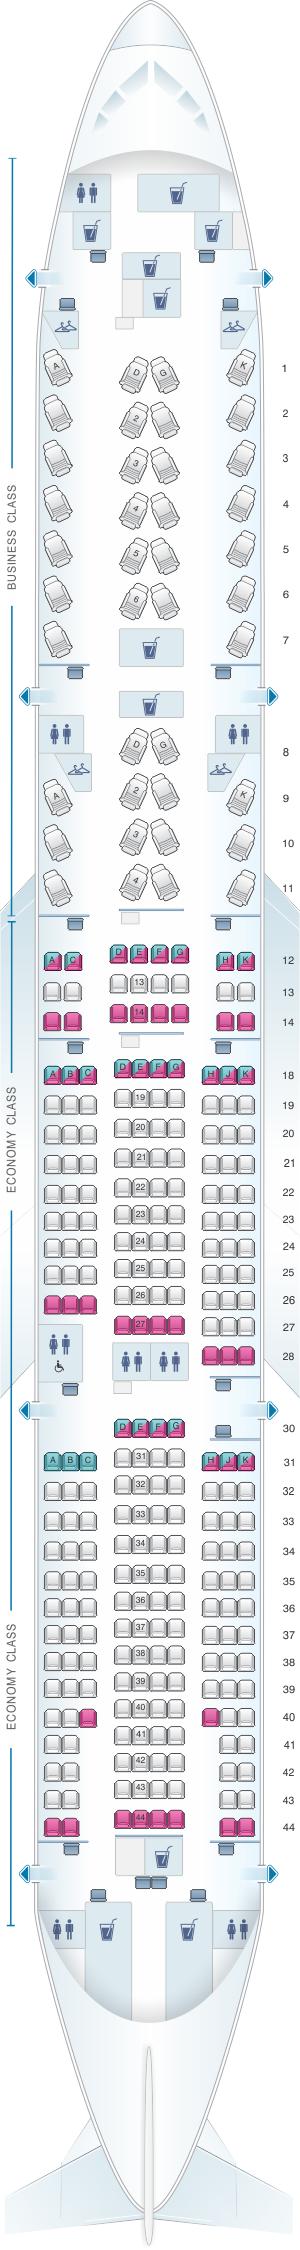 Air Canada Ac 15 Seat Map Air Canada Seat Map 777